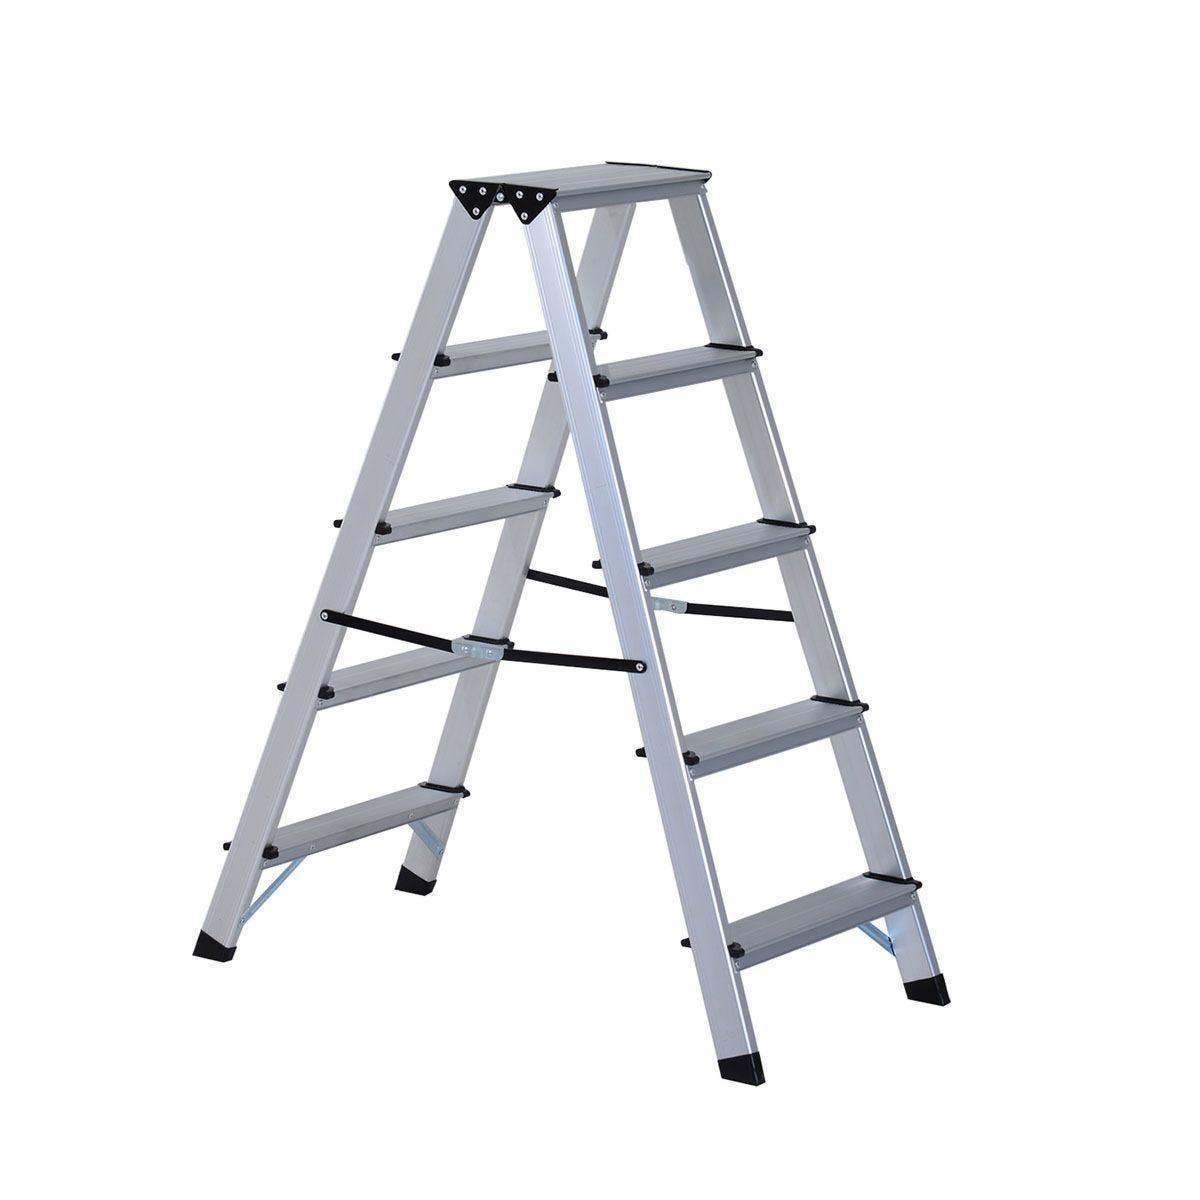 HOMCOM Foldable Aluminum Ladder A-Type Multi-functional Folding Step Platform - Silver